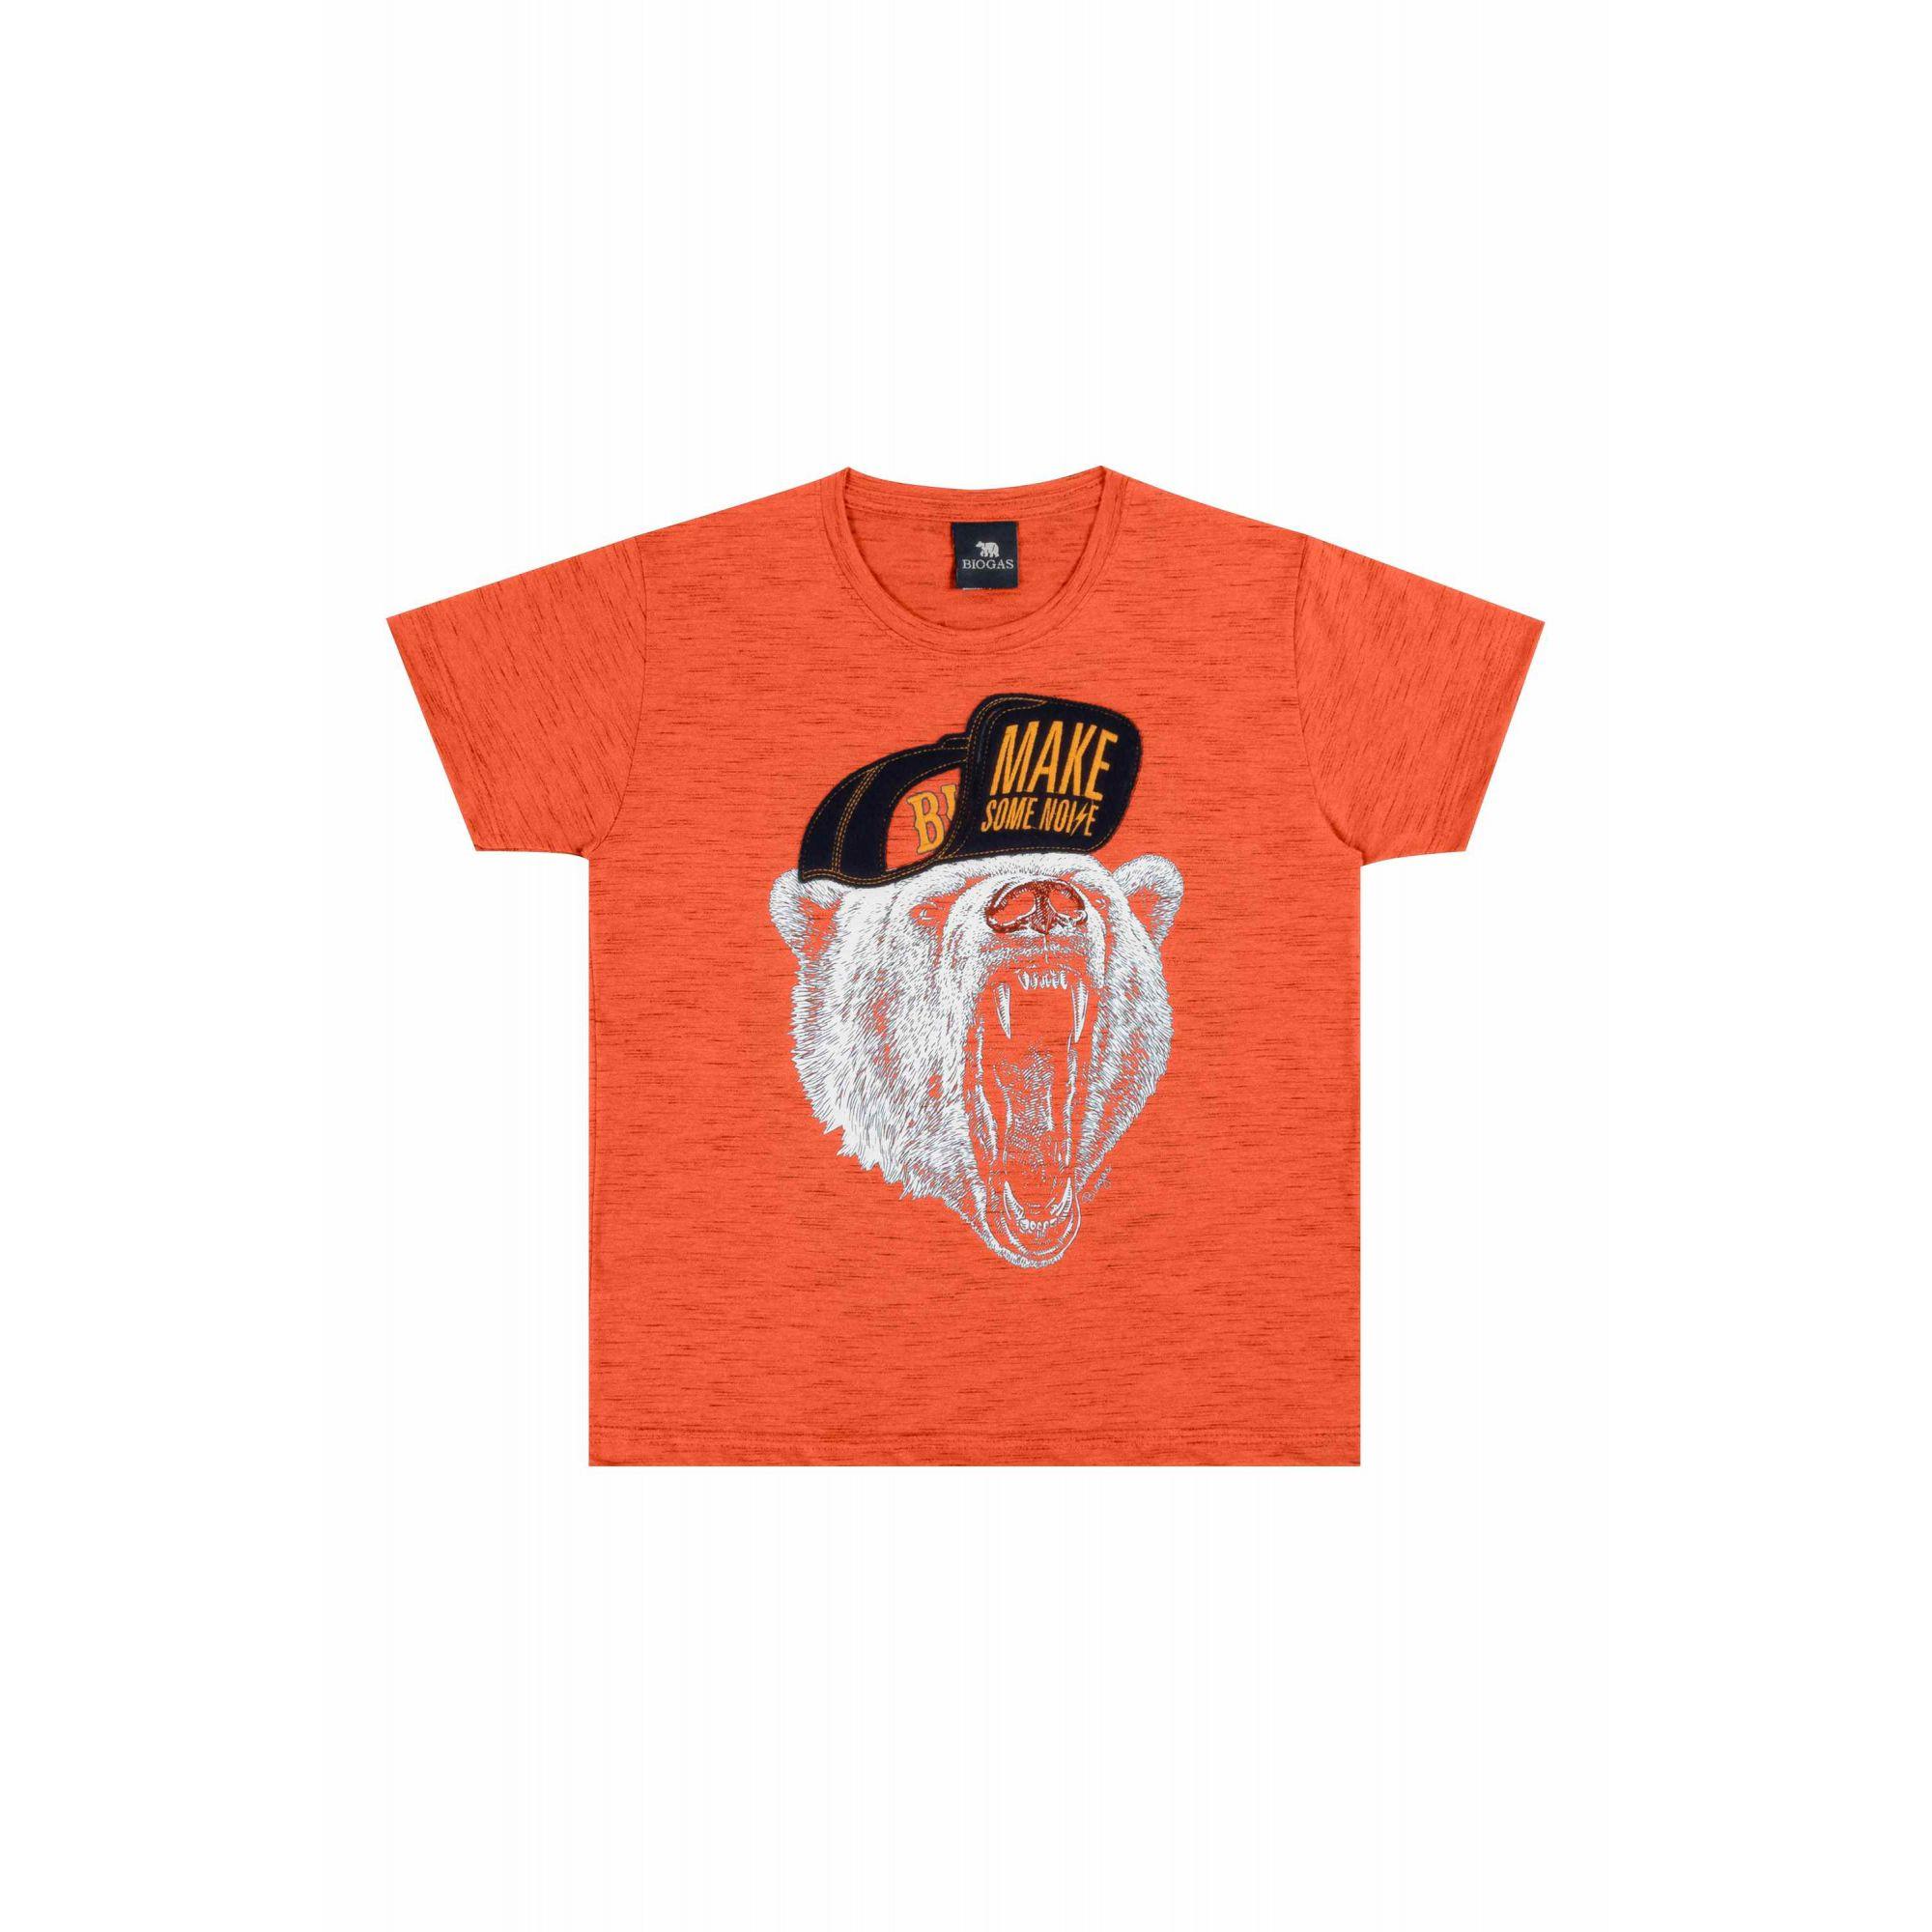 Camiseta Masculino Tr Inf Bg  22825